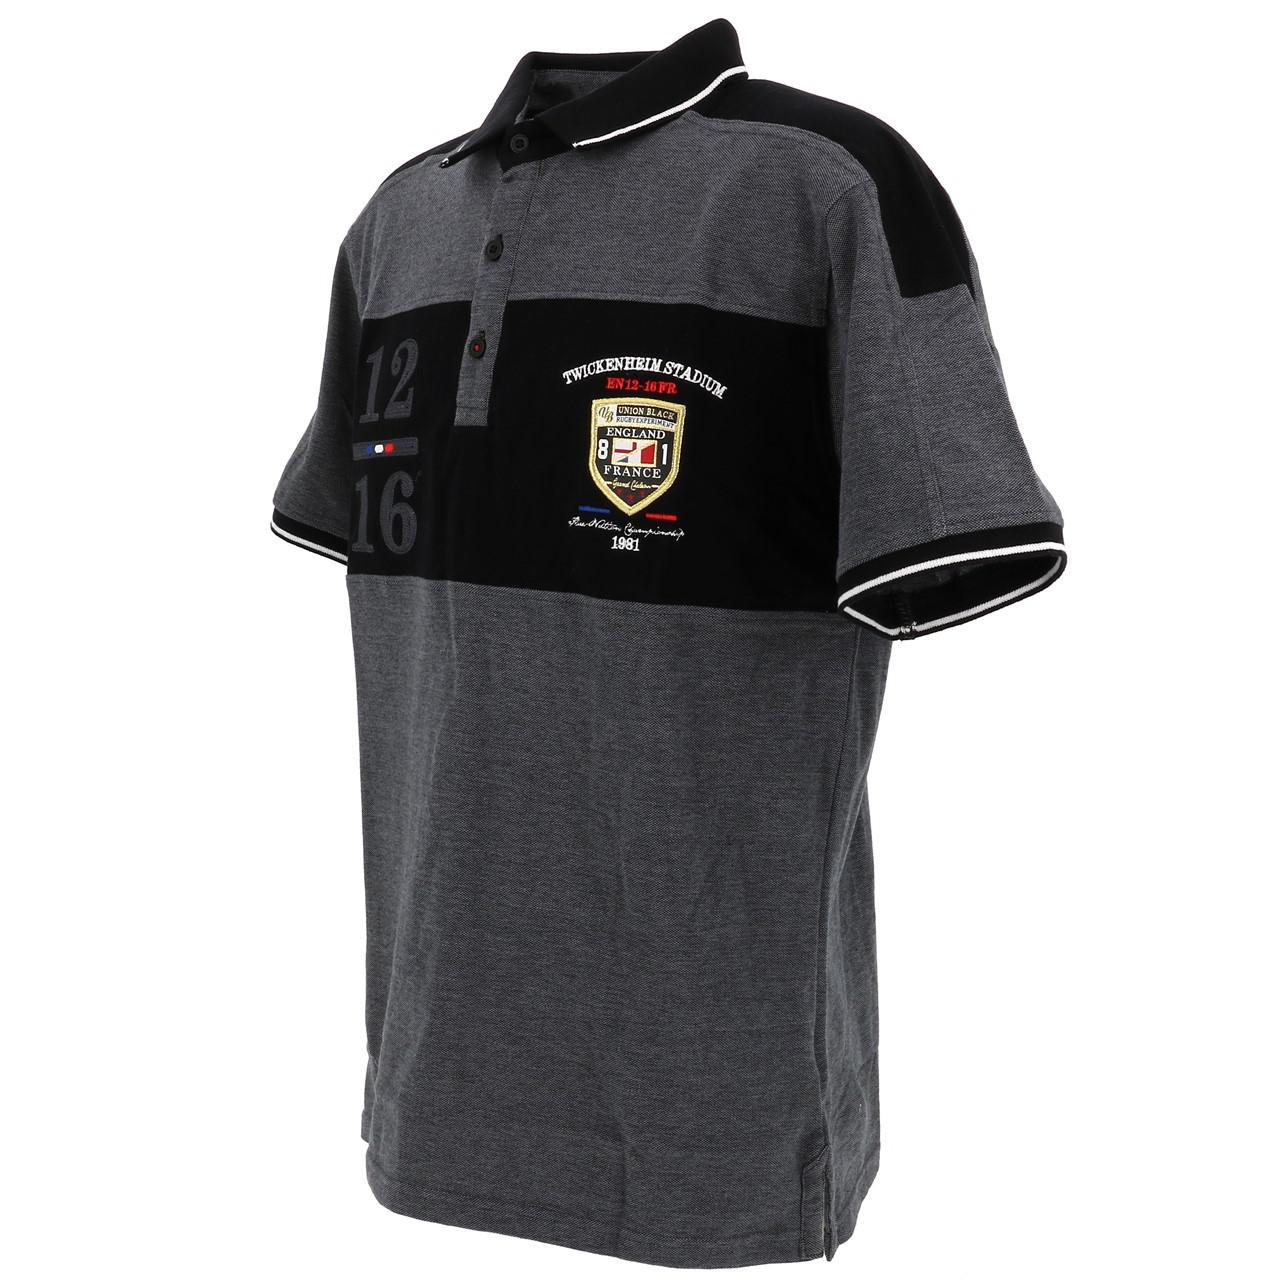 Short-Sleeve-Polo-Union-Black-League-Black-Mc-Polo-Black-18769-New thumbnail 4